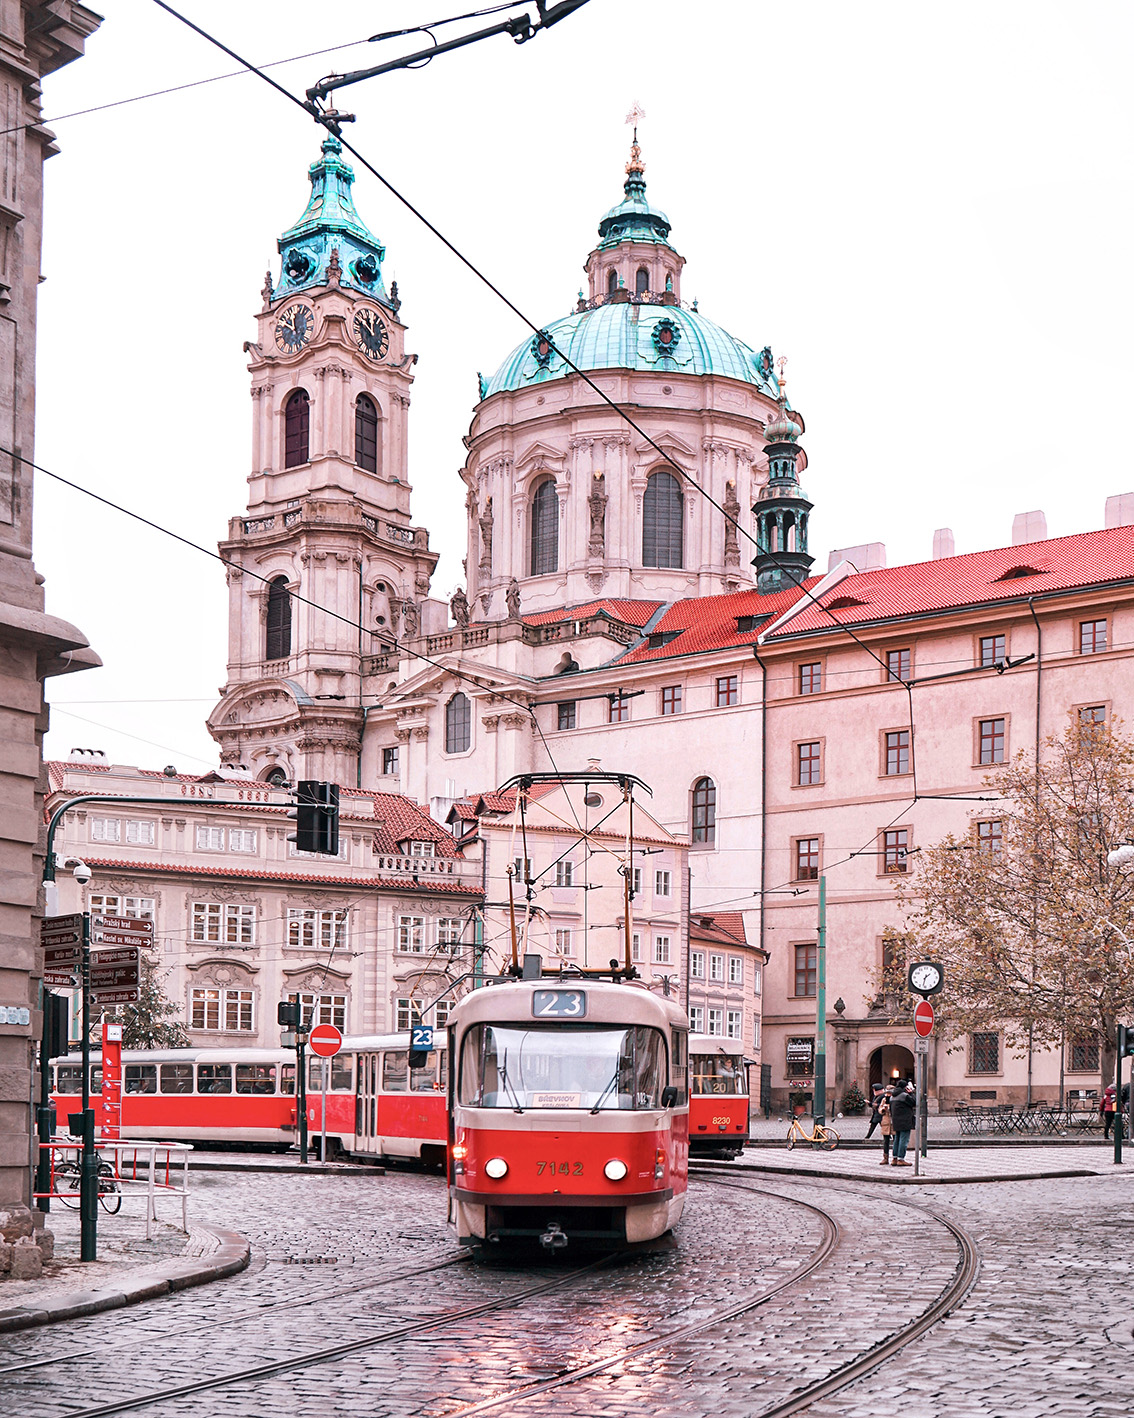 27 Weekend a Praga: 7 cose da vedere, dove dormire, gli indirizzi food e i Mercatini di Natale più belli.